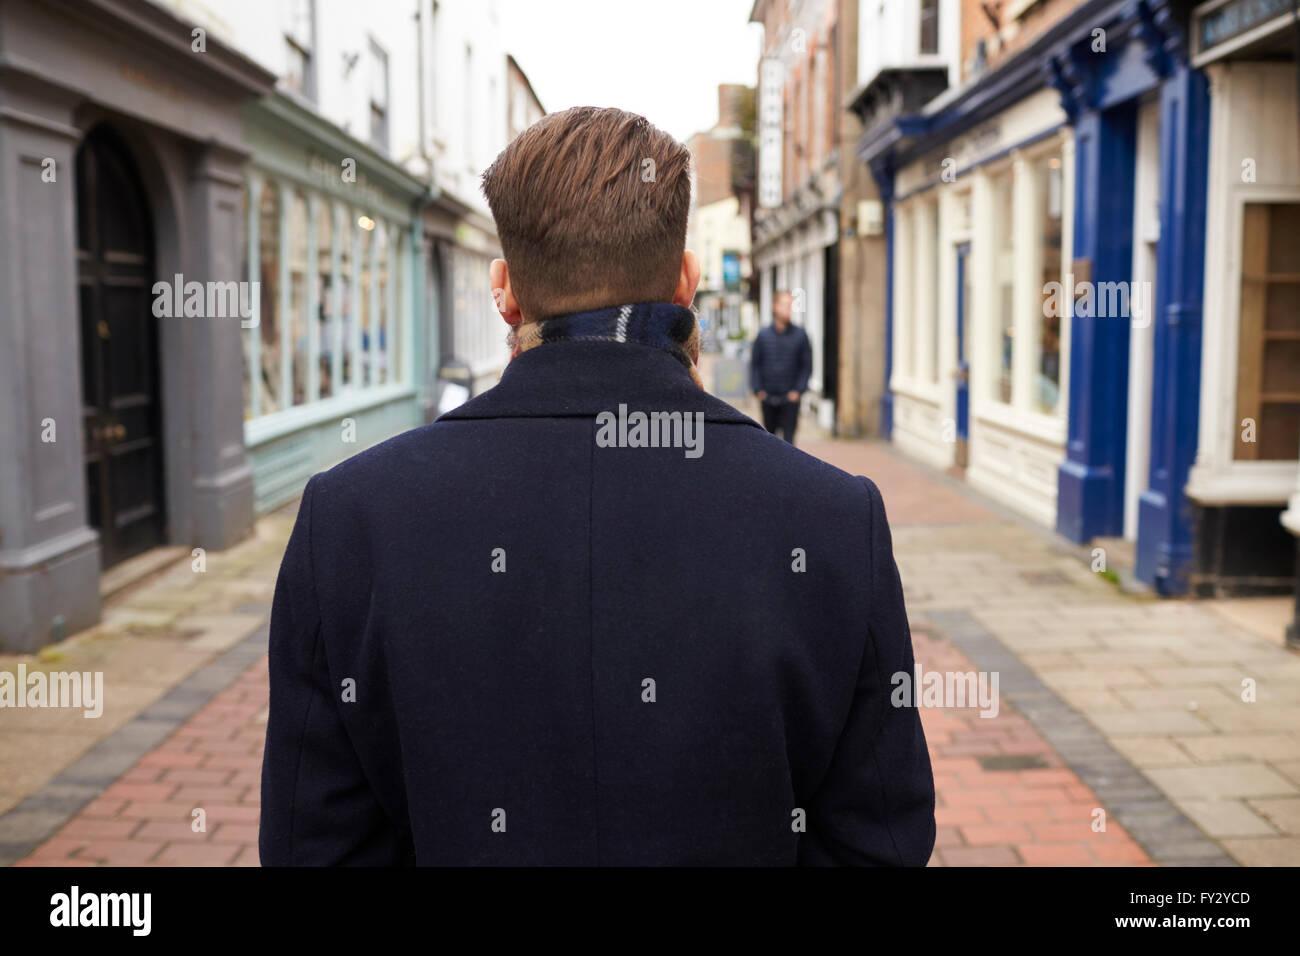 Rear View Of Young Man Walking Down Urban Street - Stock Image